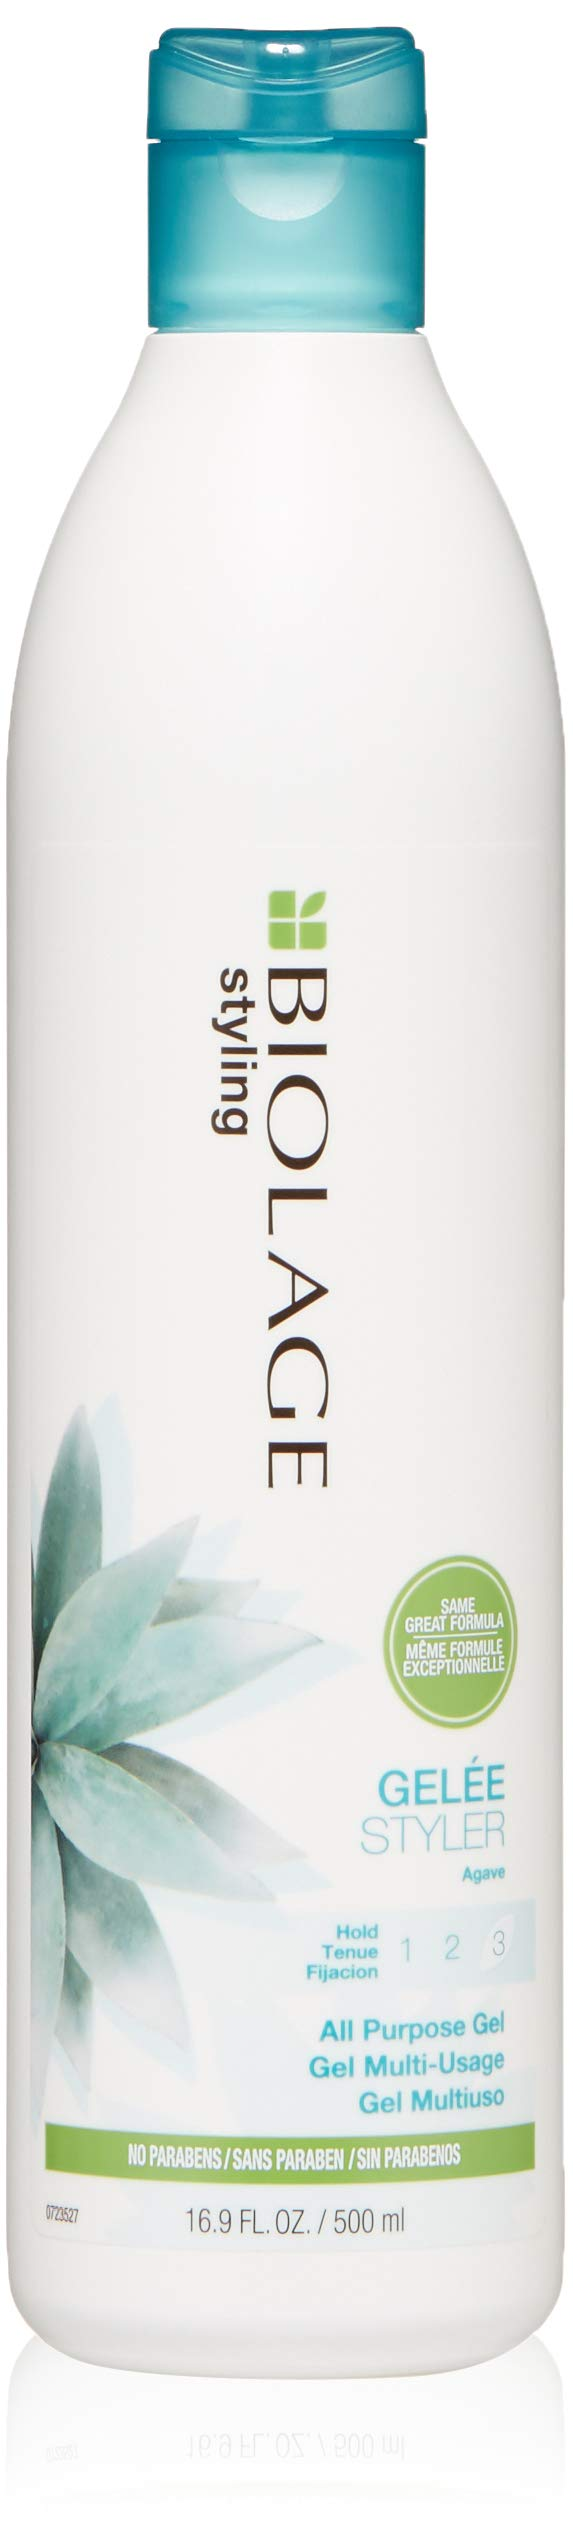 BIOLAGE Styling Gelée, 16.89 fl. oz.